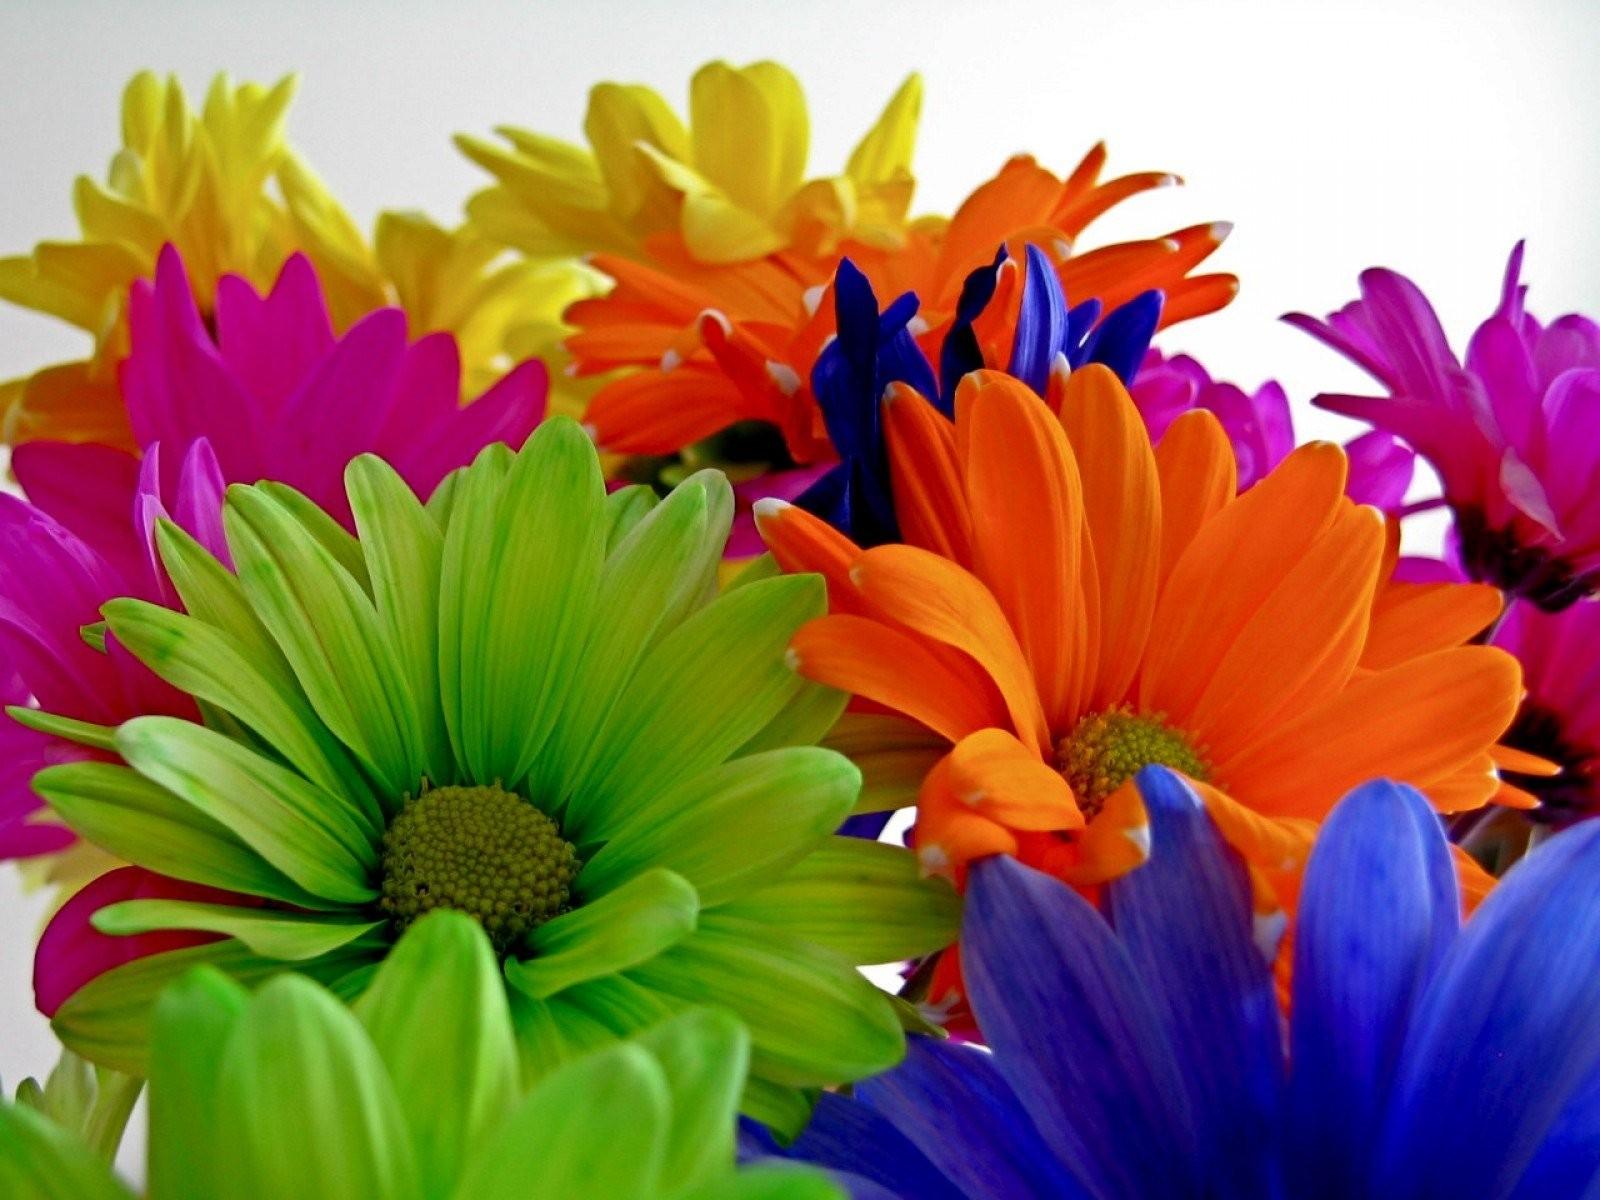 Free photo: Multi Color Flowers - Plants, Nature, Multicolor - Free ...